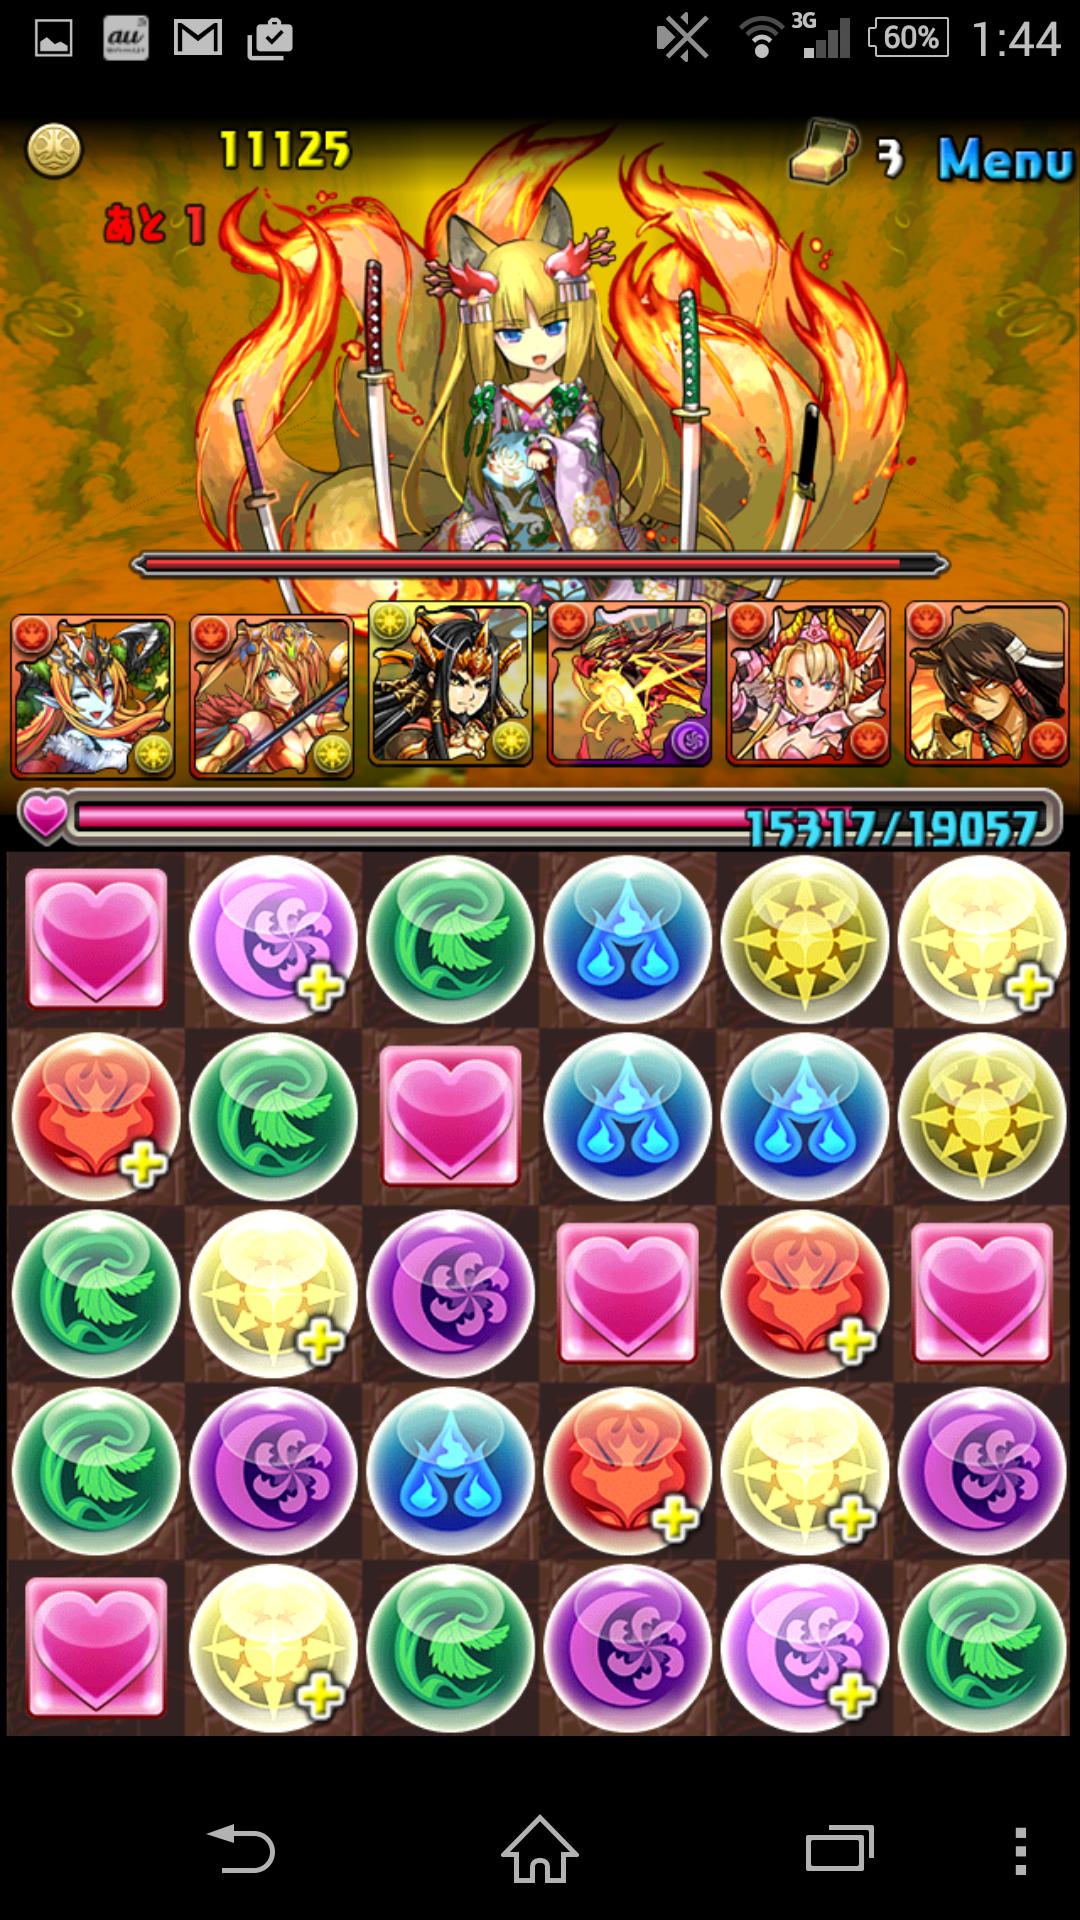 Screenshot_2015-01-20-01-44-12.png